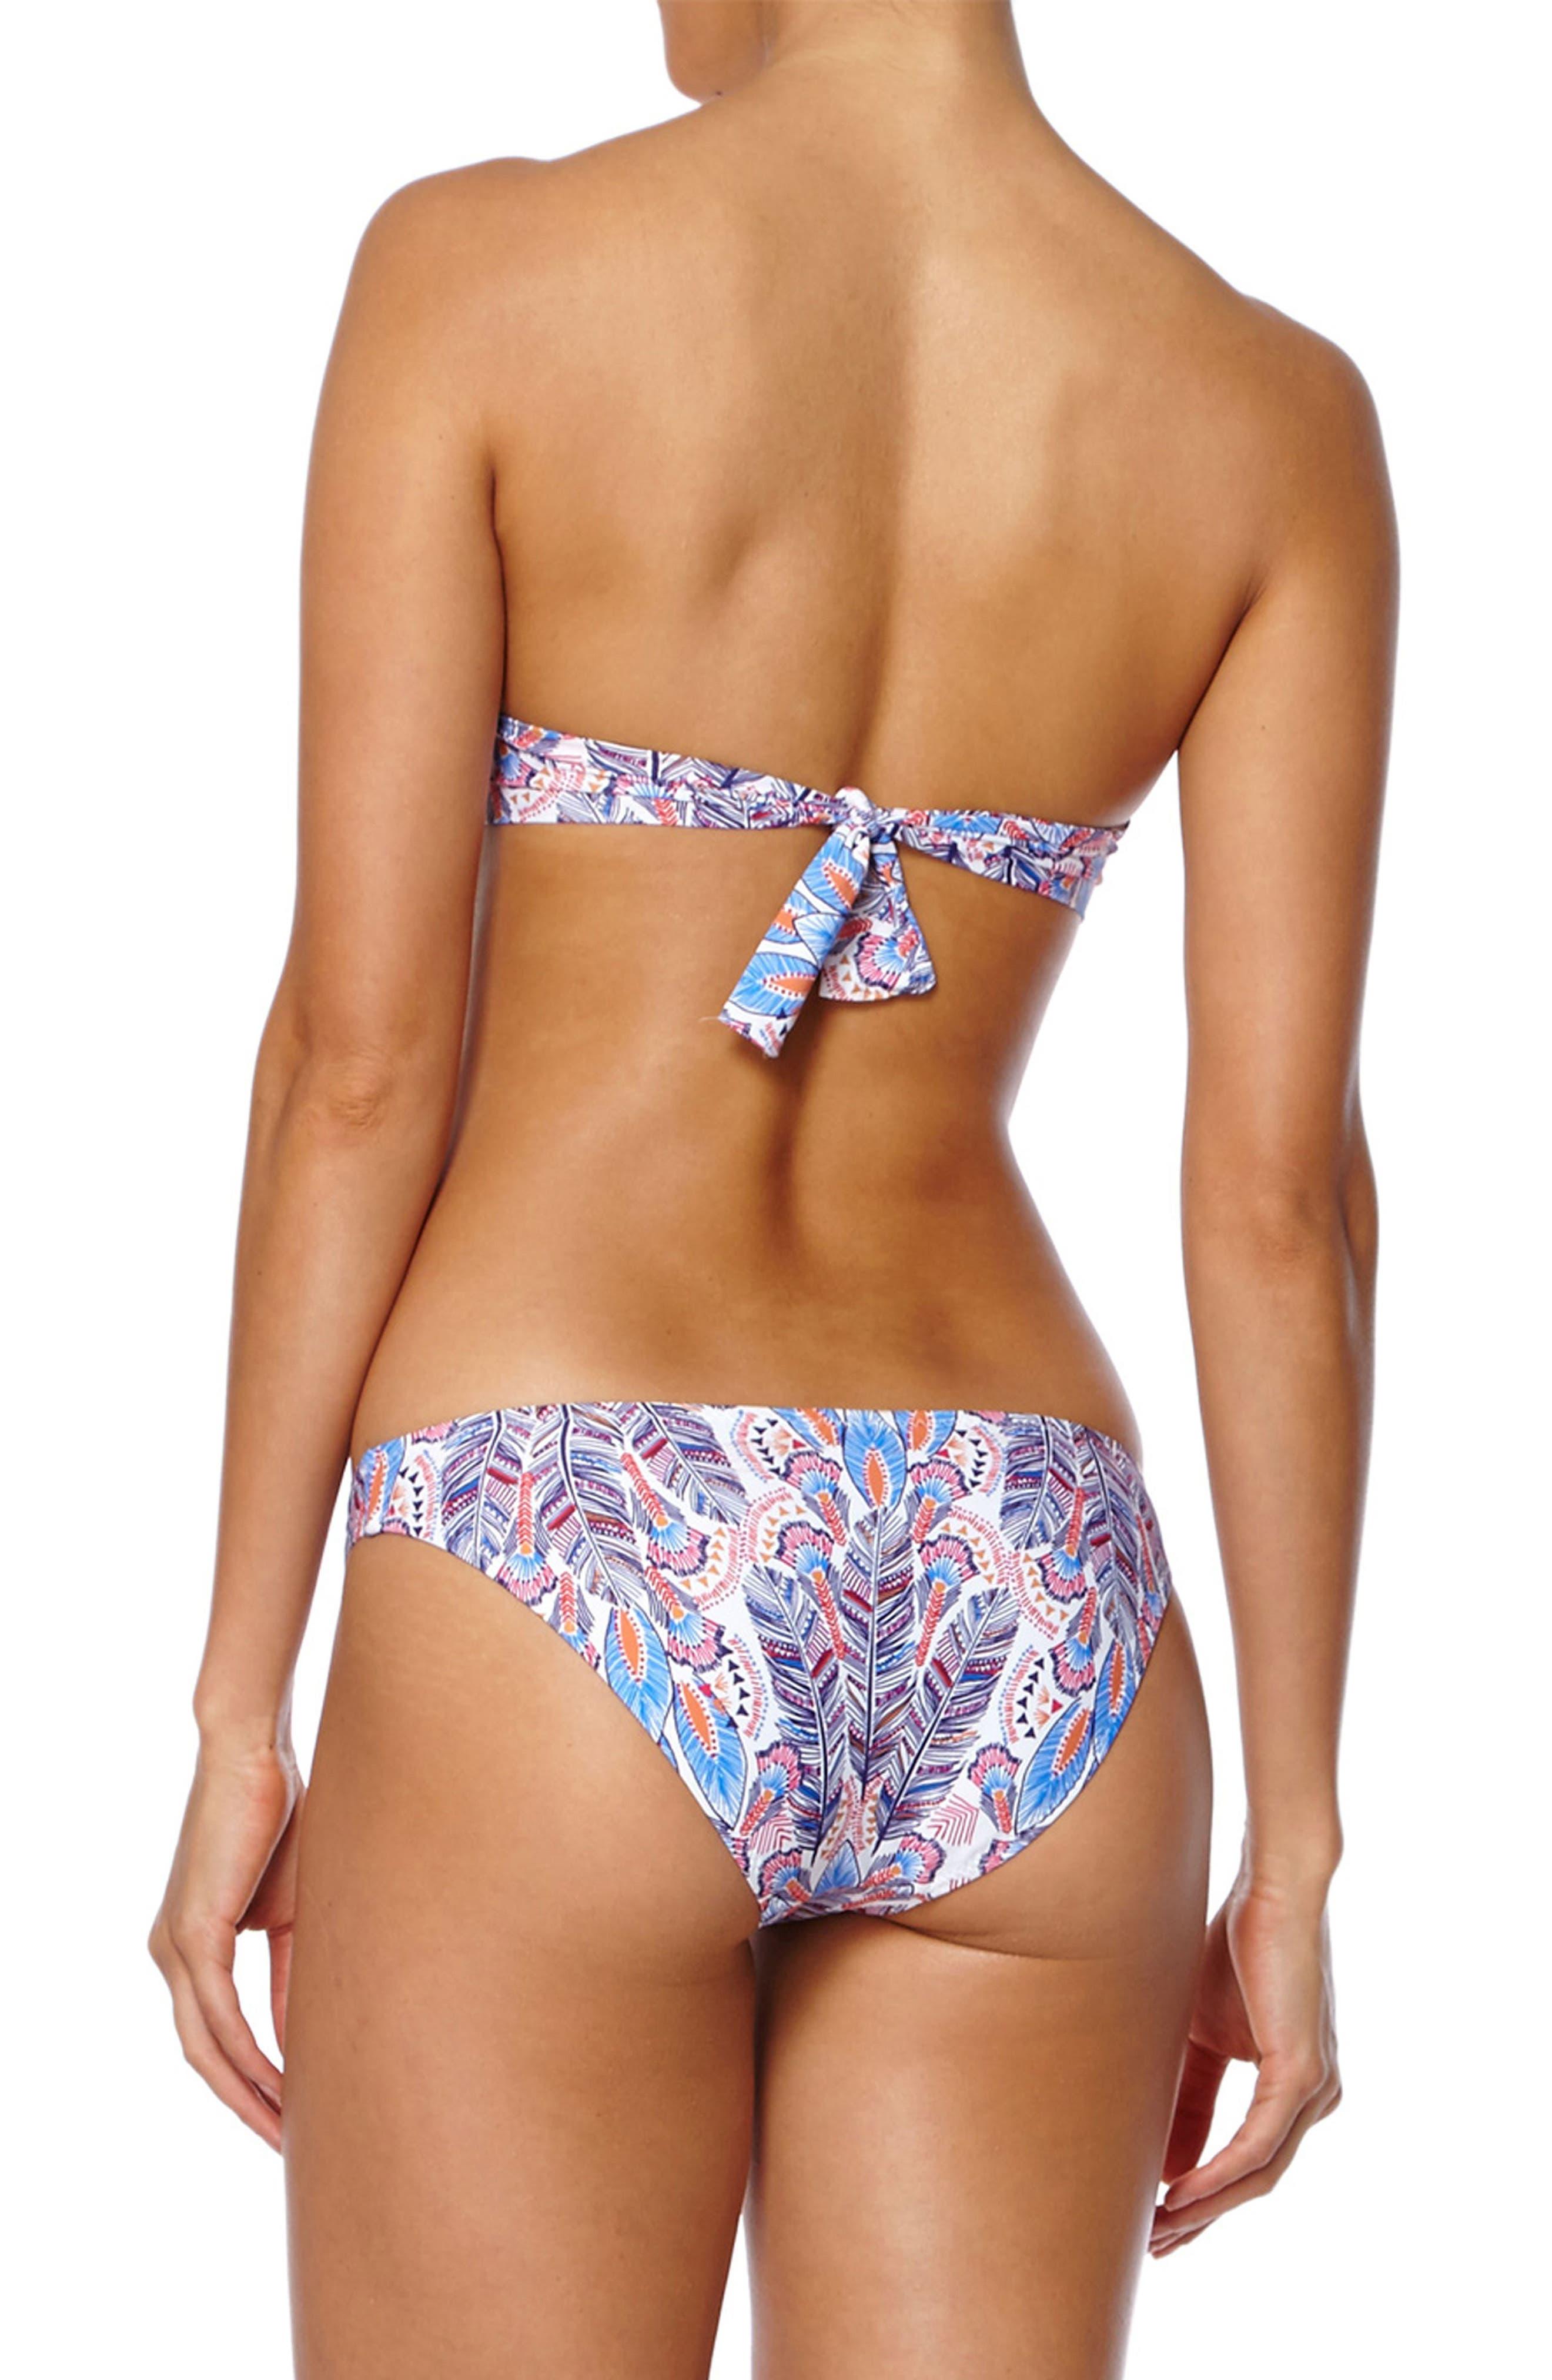 Martinique Bandeau Bikini Top,                             Alternate thumbnail 4, color,                             Feathers